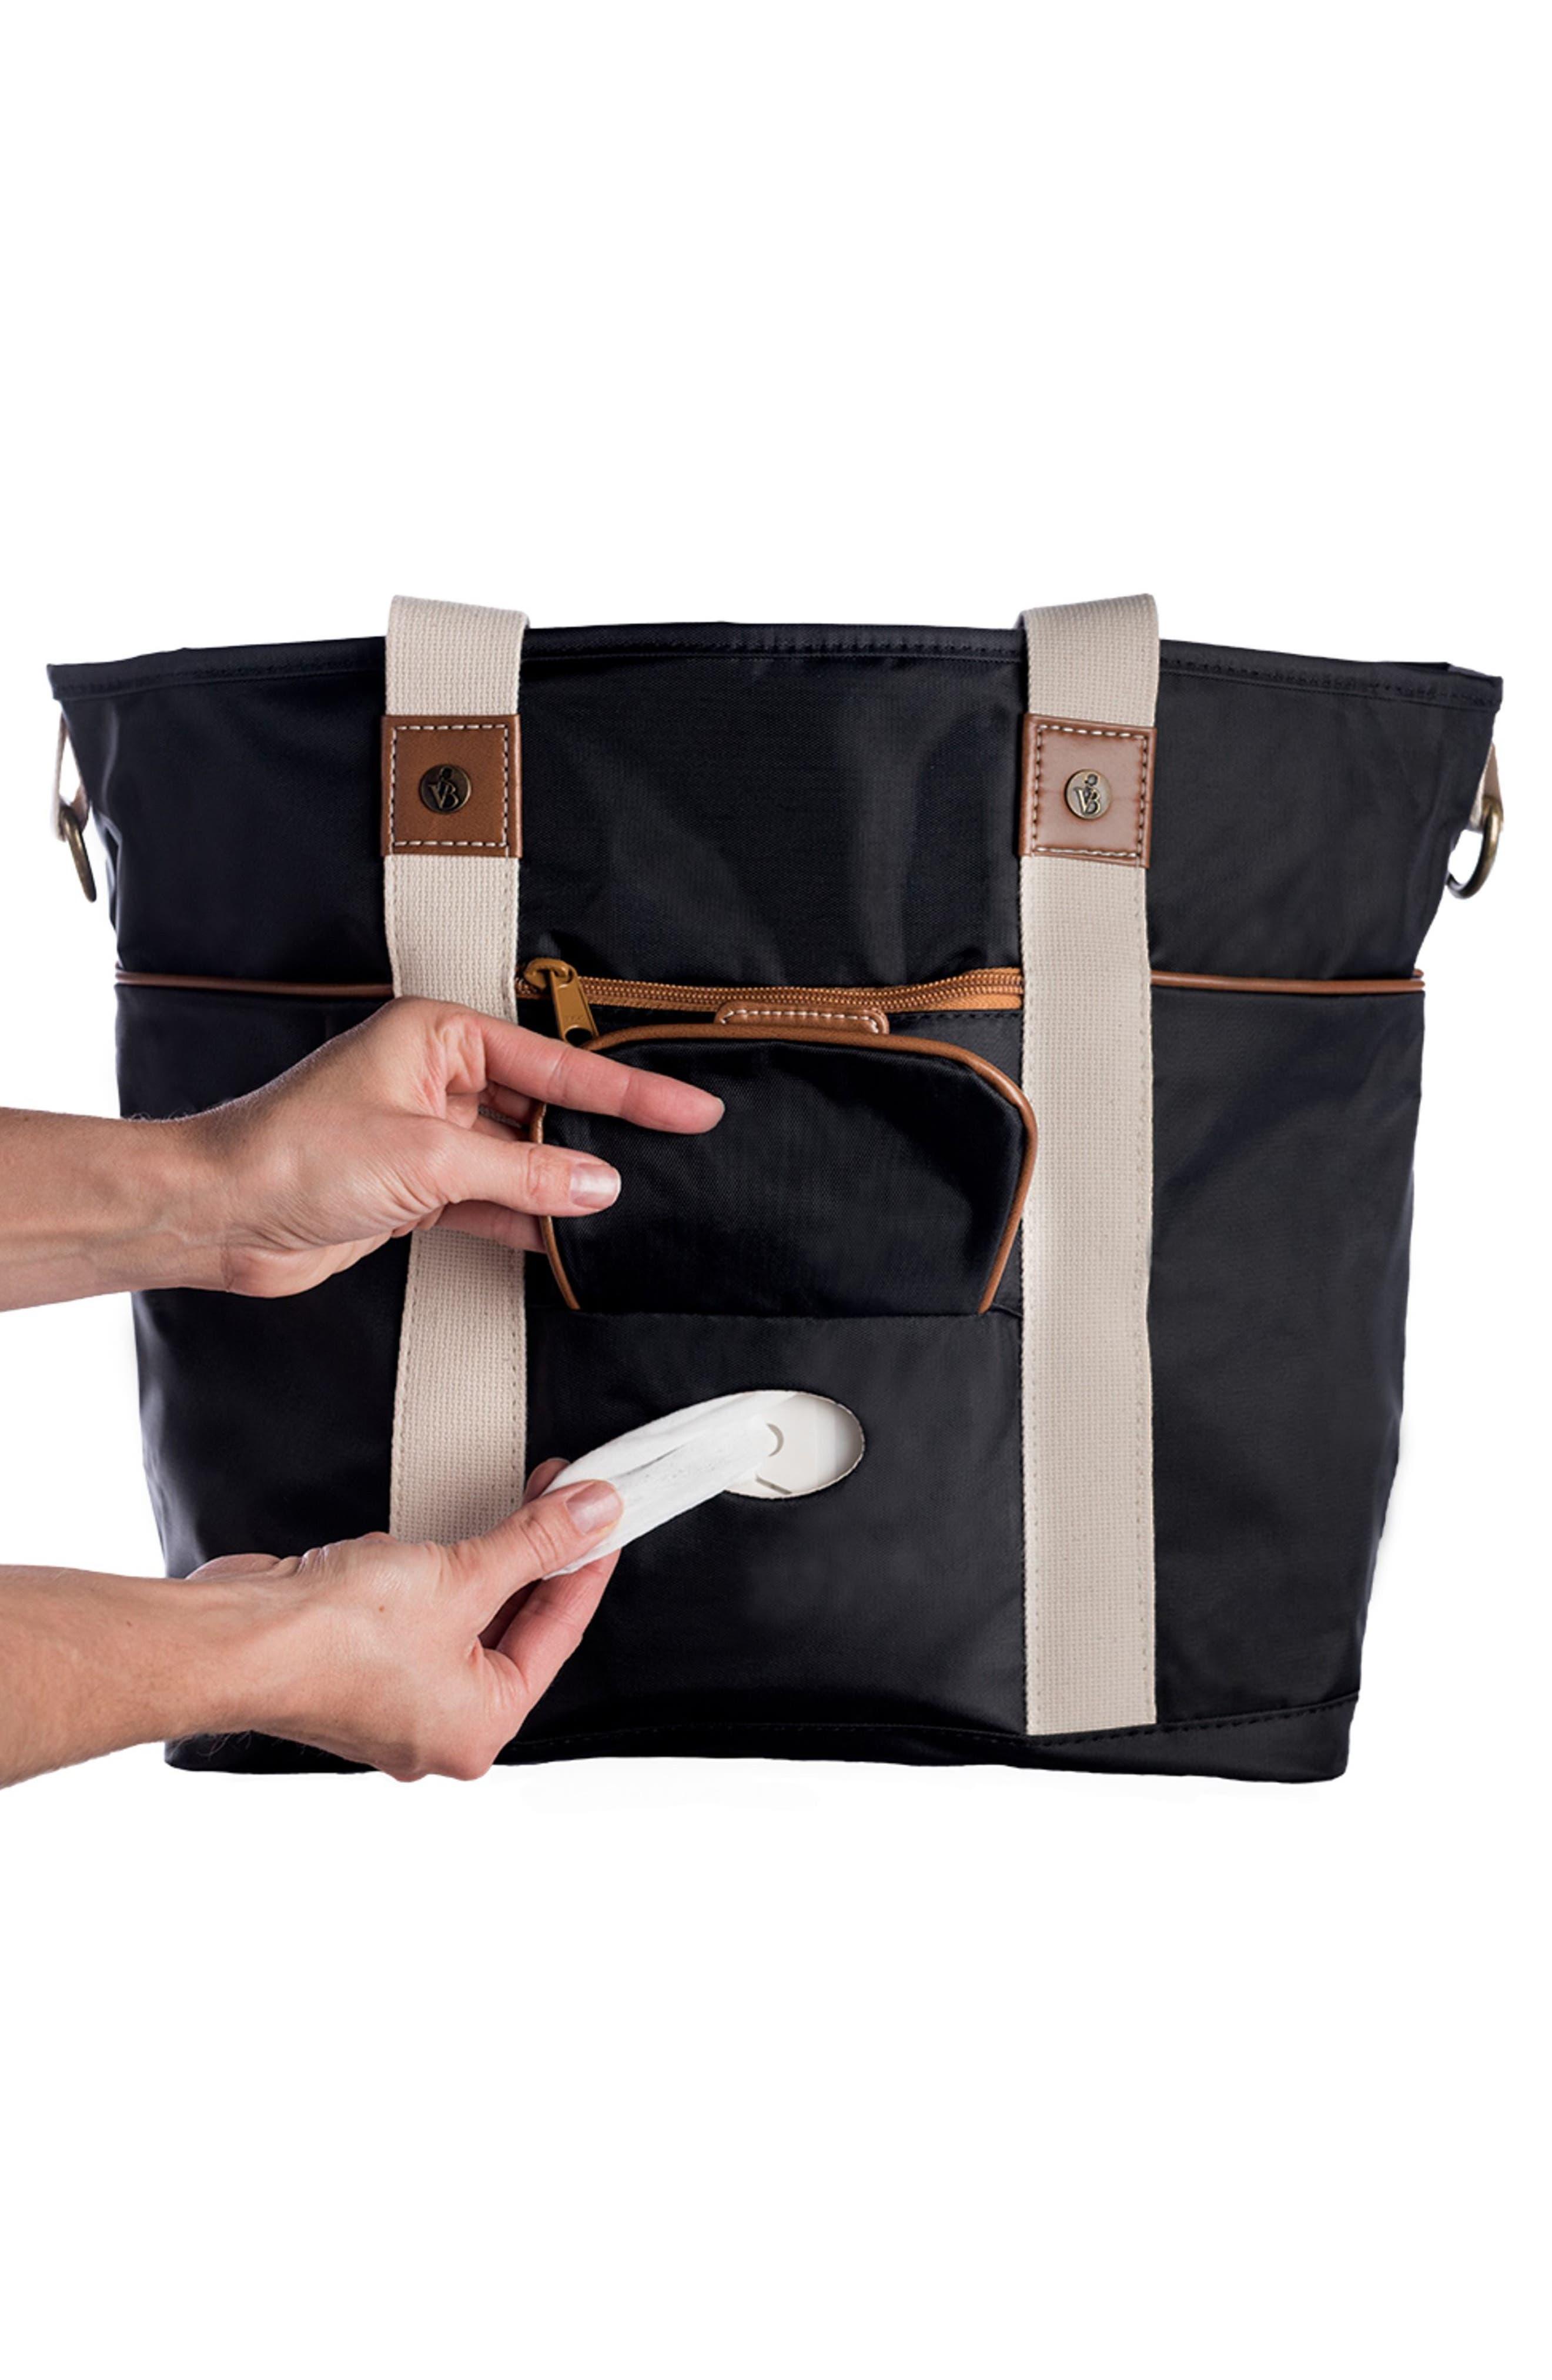 Harbor Side Tote Diaper Bag,                             Alternate thumbnail 6, color,                             001